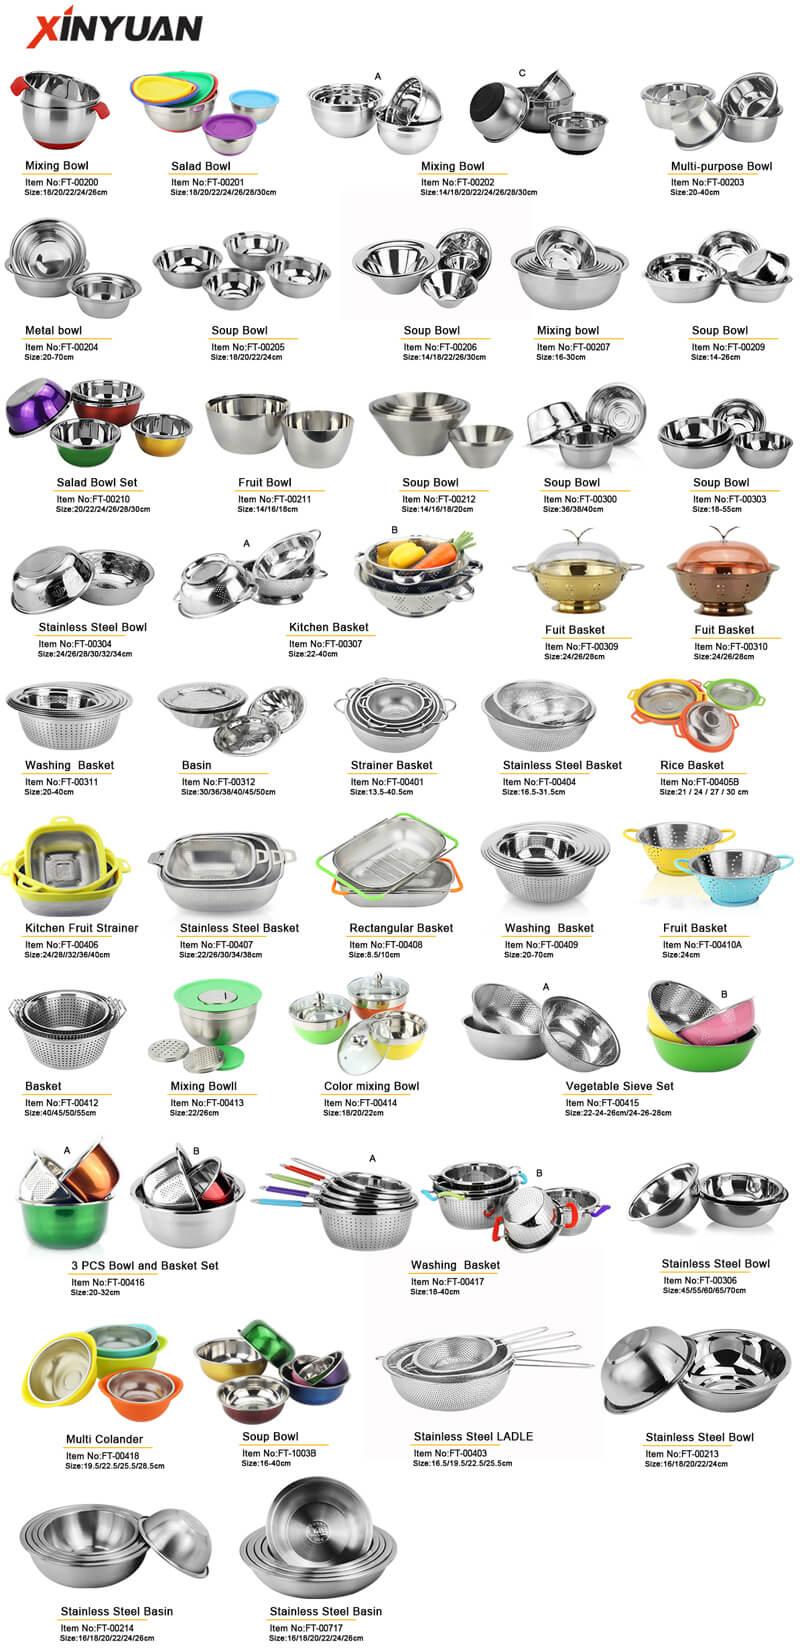 basin stainless steel kitchenware